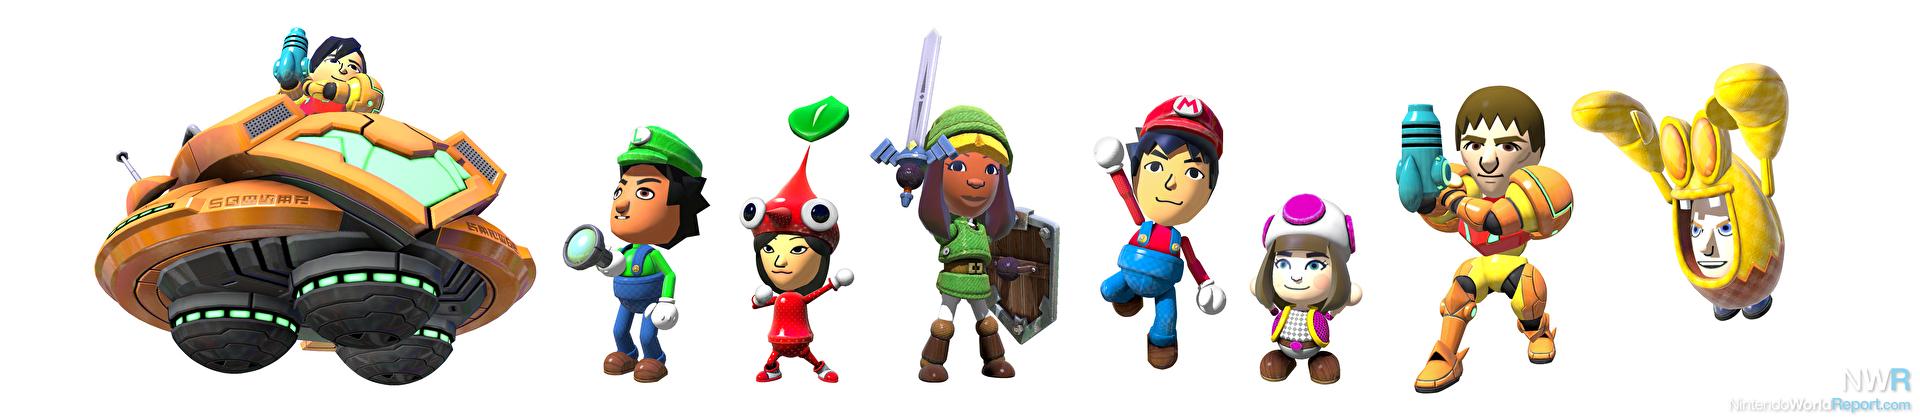 NintendoLAnd_Art